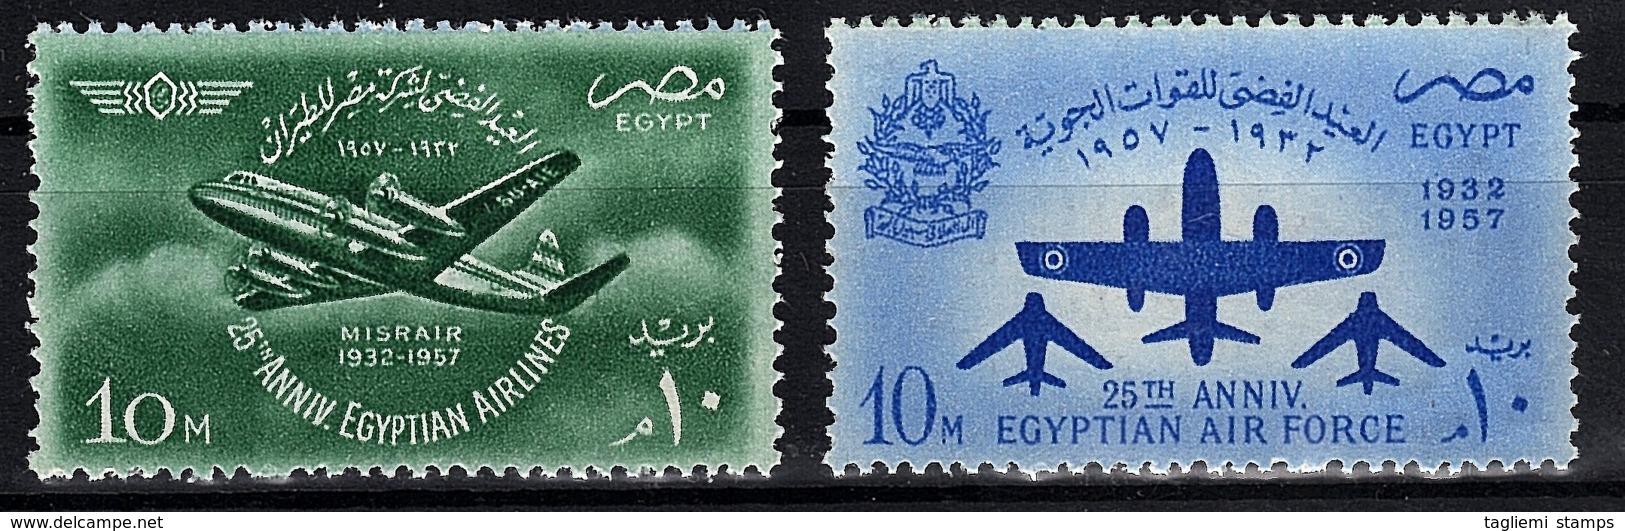 Egypt, 1957, SG 545 - 546, MNH - Egypt